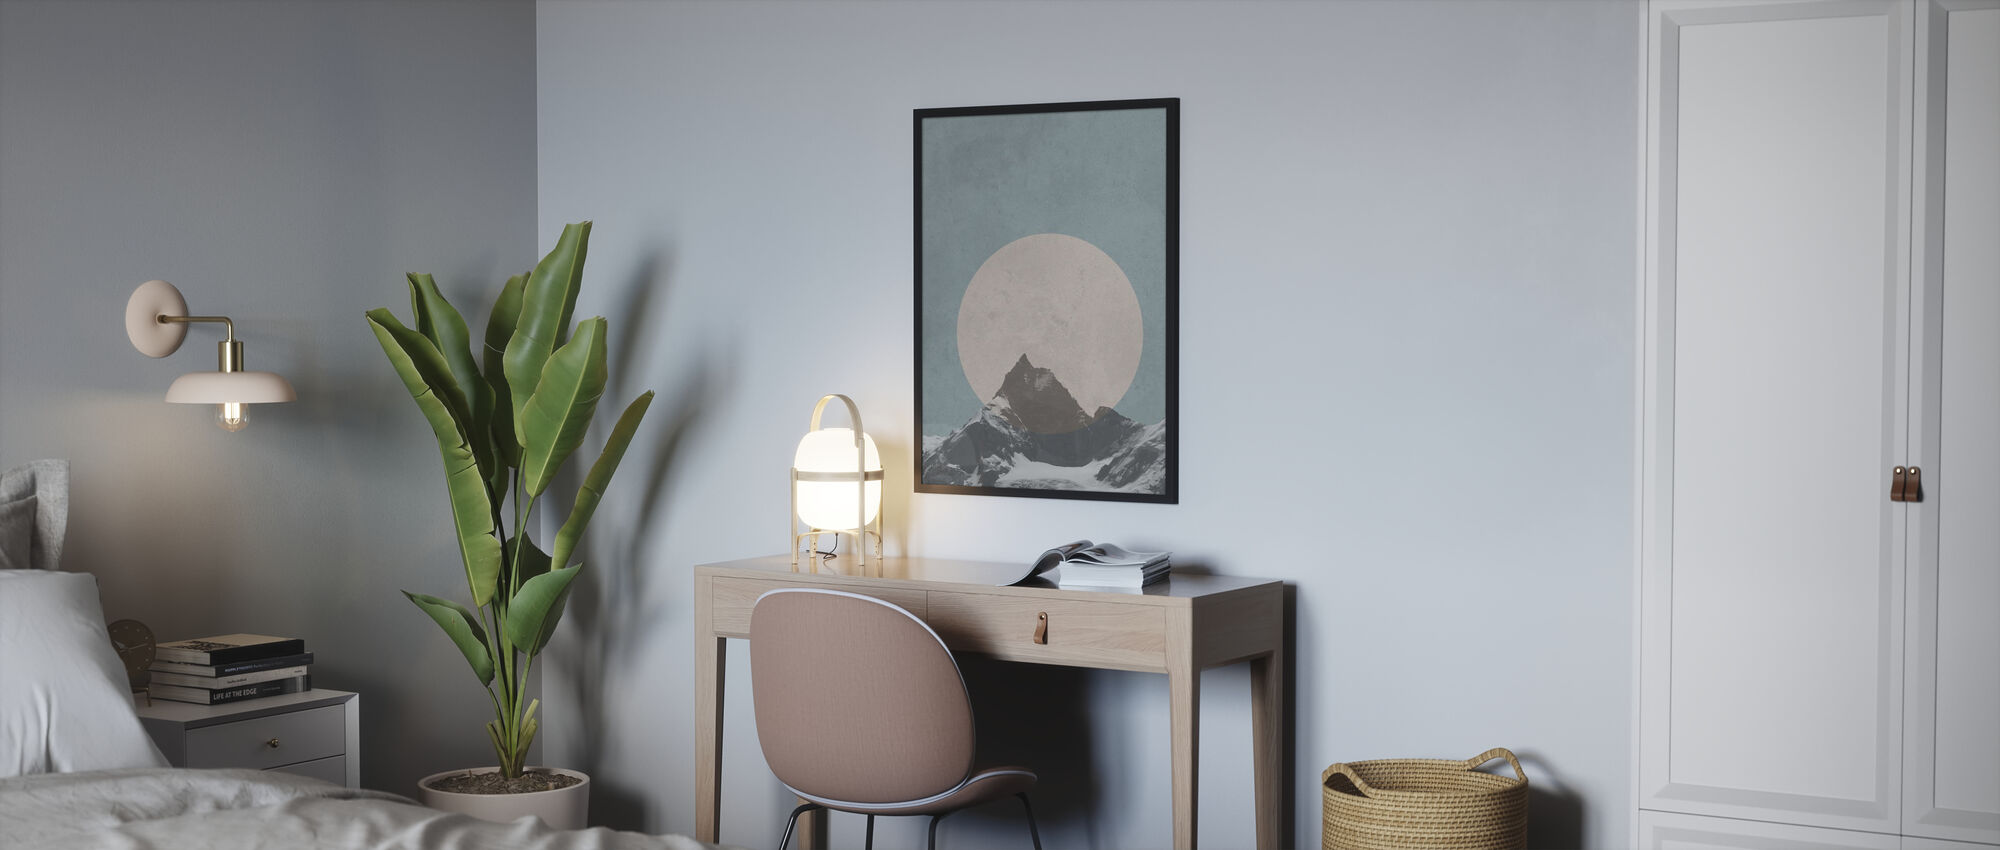 Vuori kosketus - Juliste - Makuuhuone